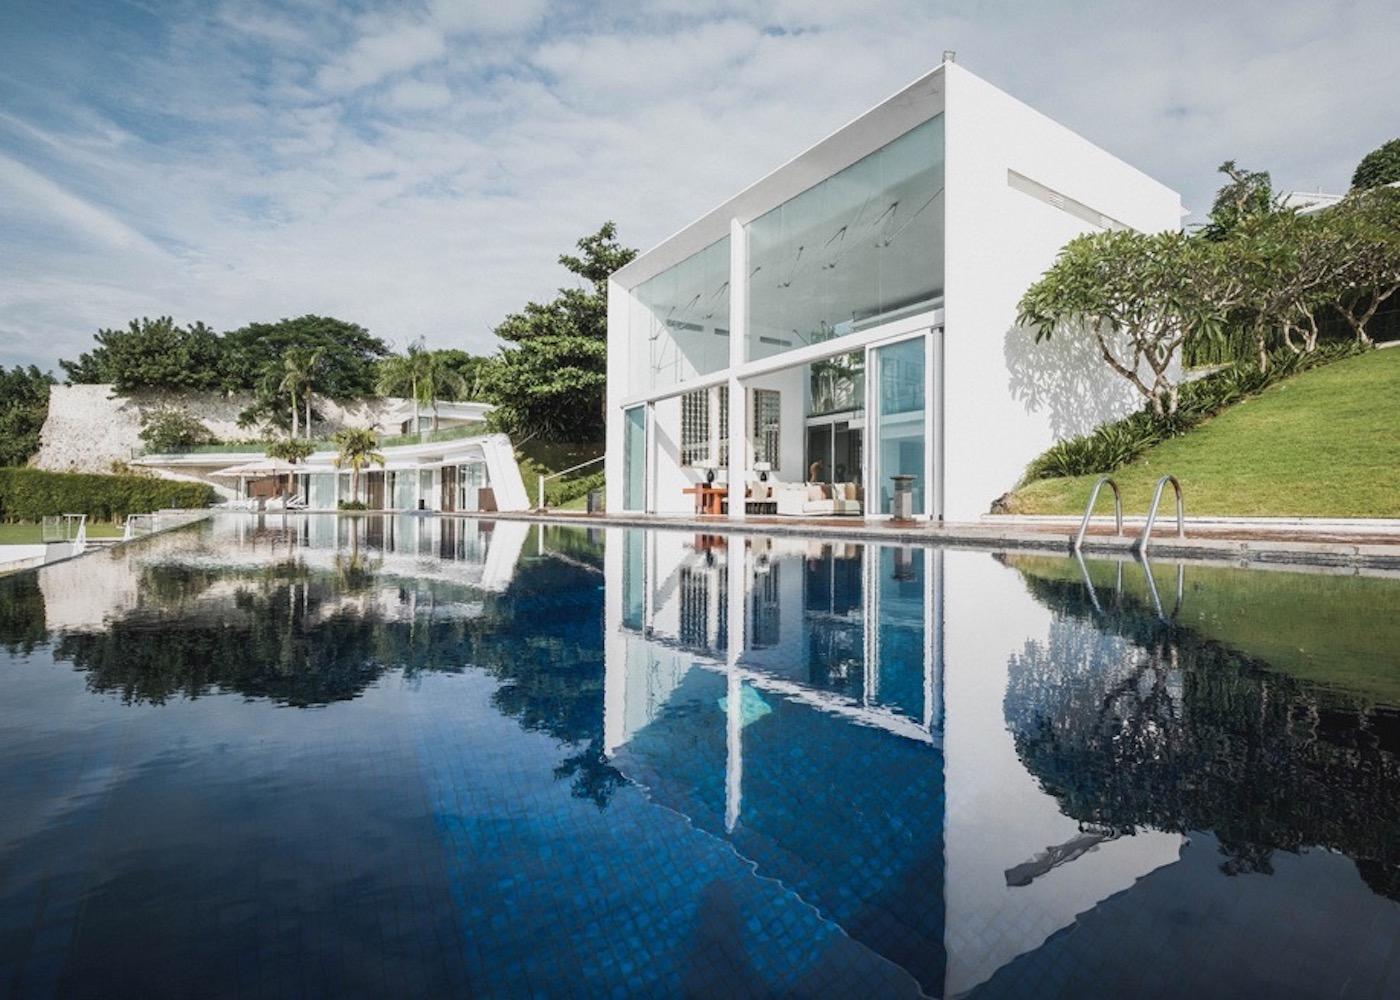 Villa Latitude - one of the most beautiful wedding villas in Bali